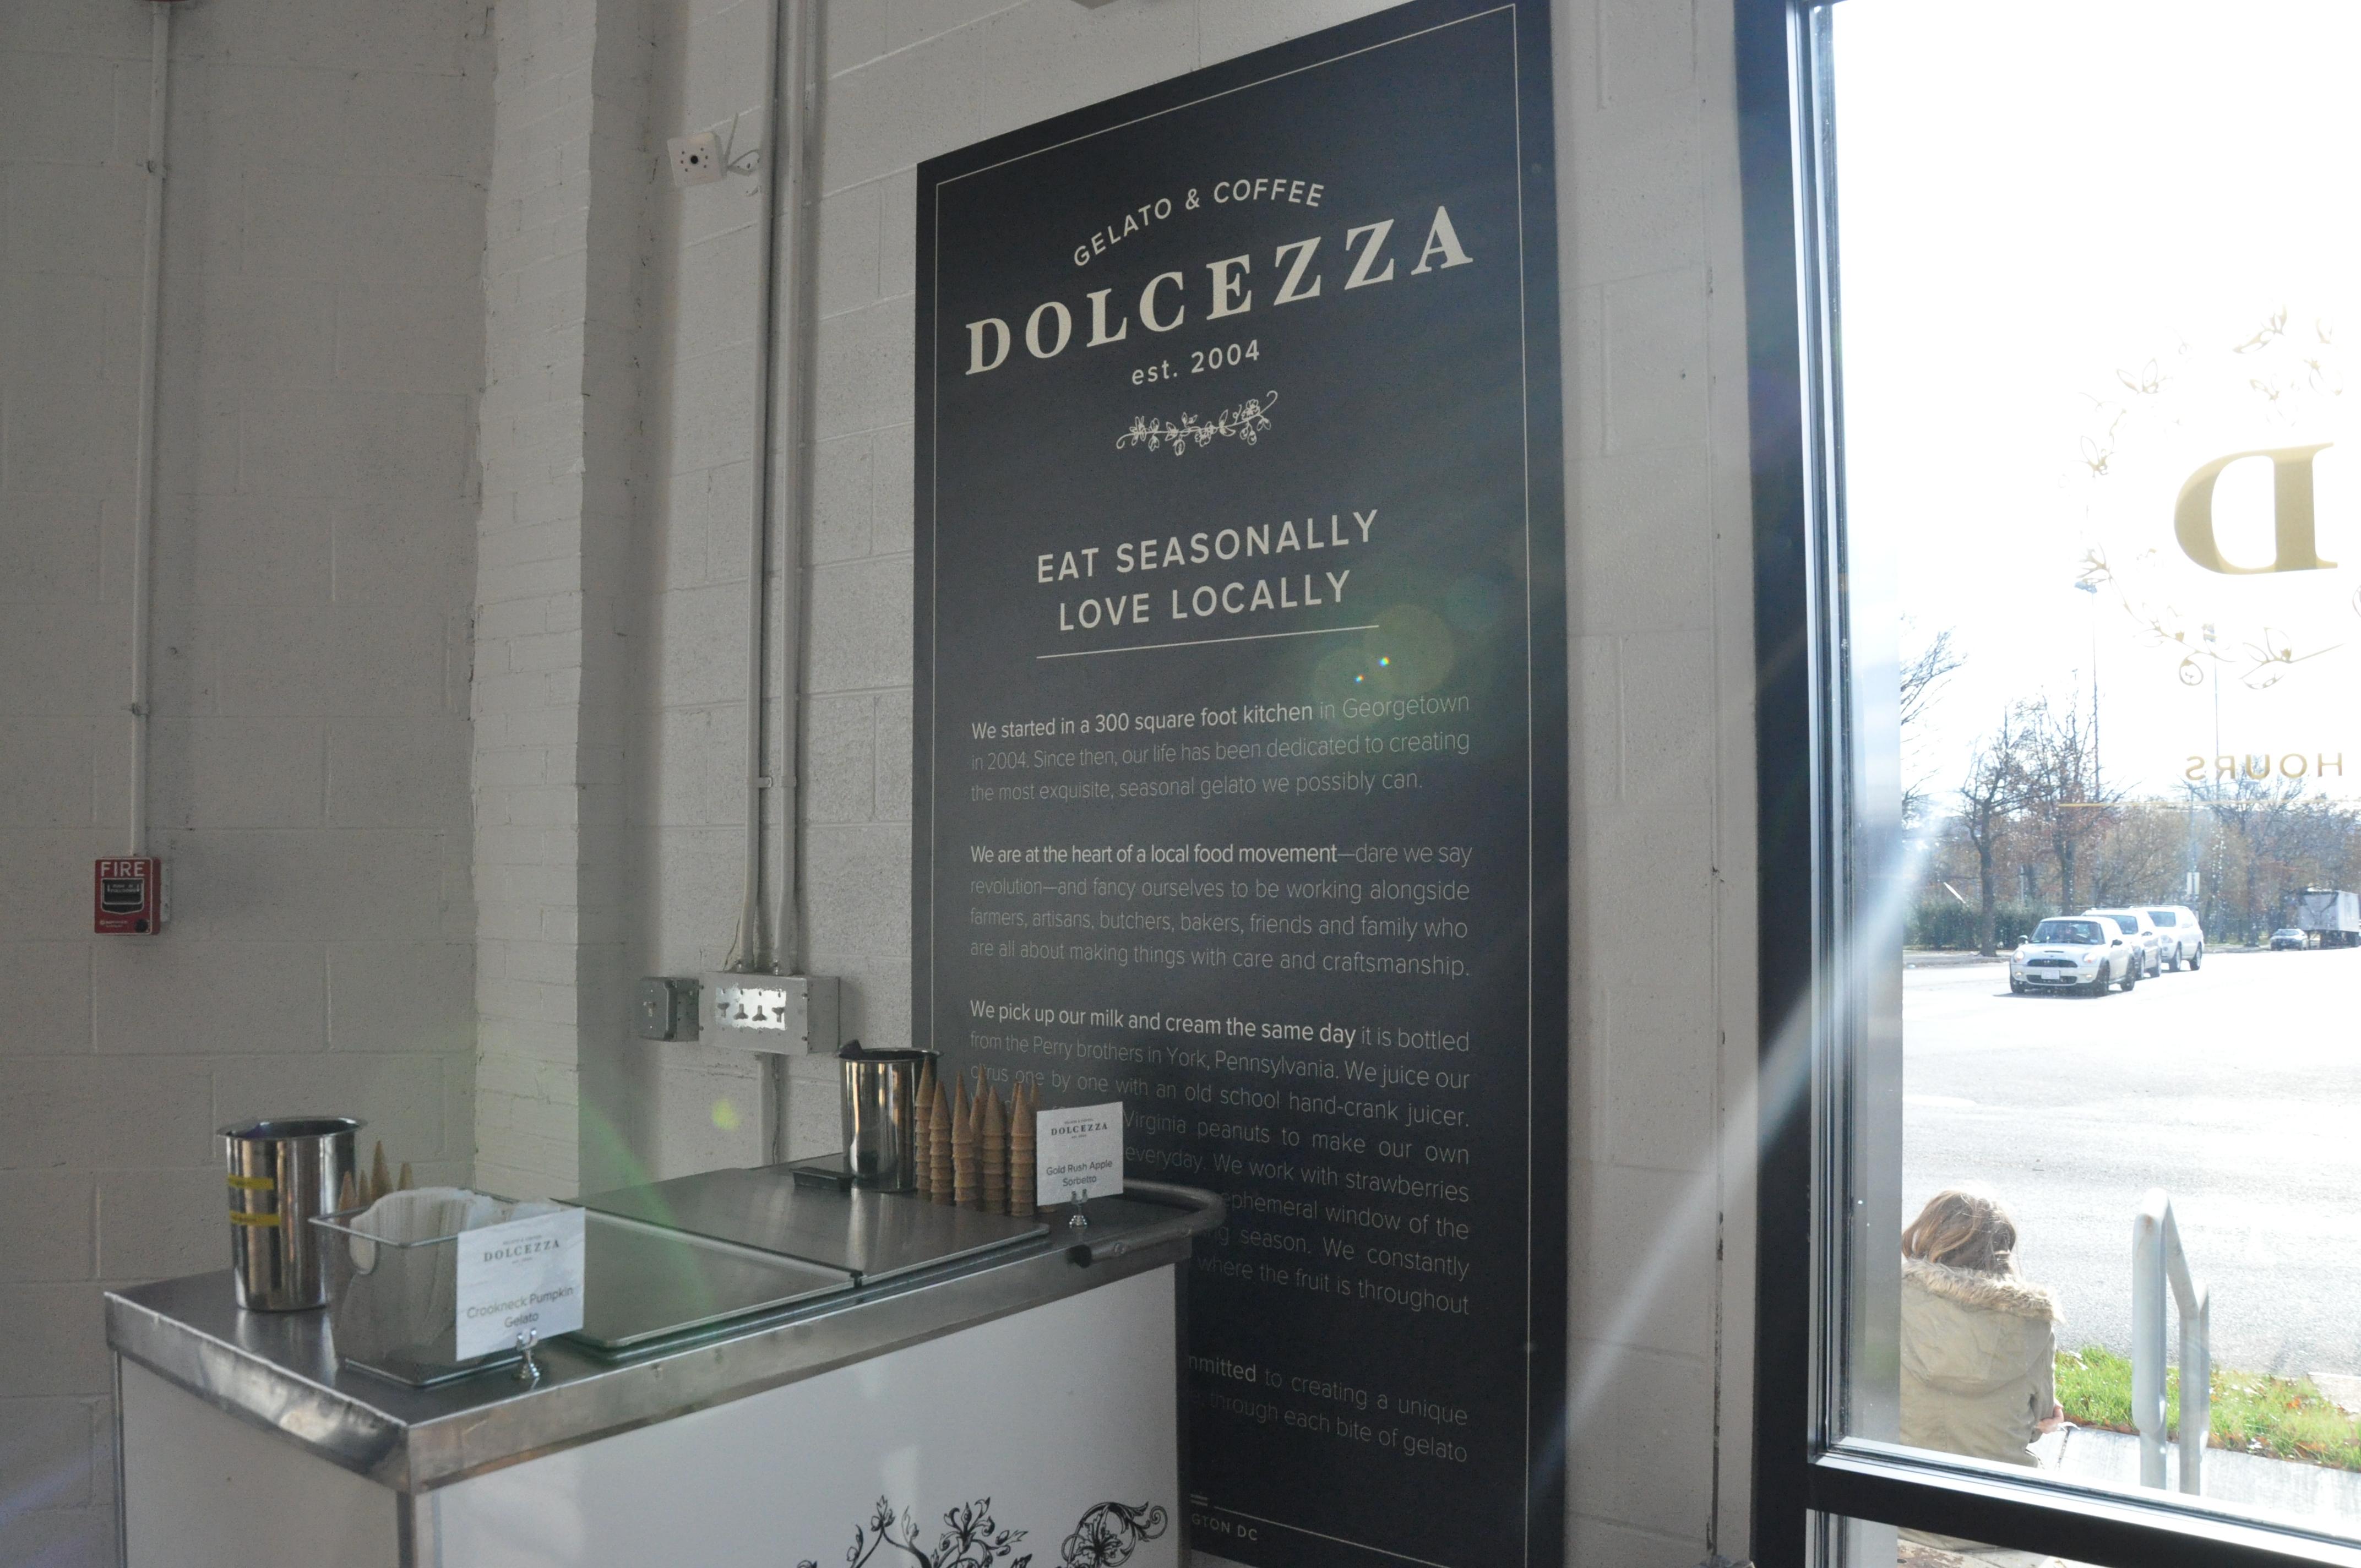 Dolcezza Gelato raising $2M amid national wholesale expansion